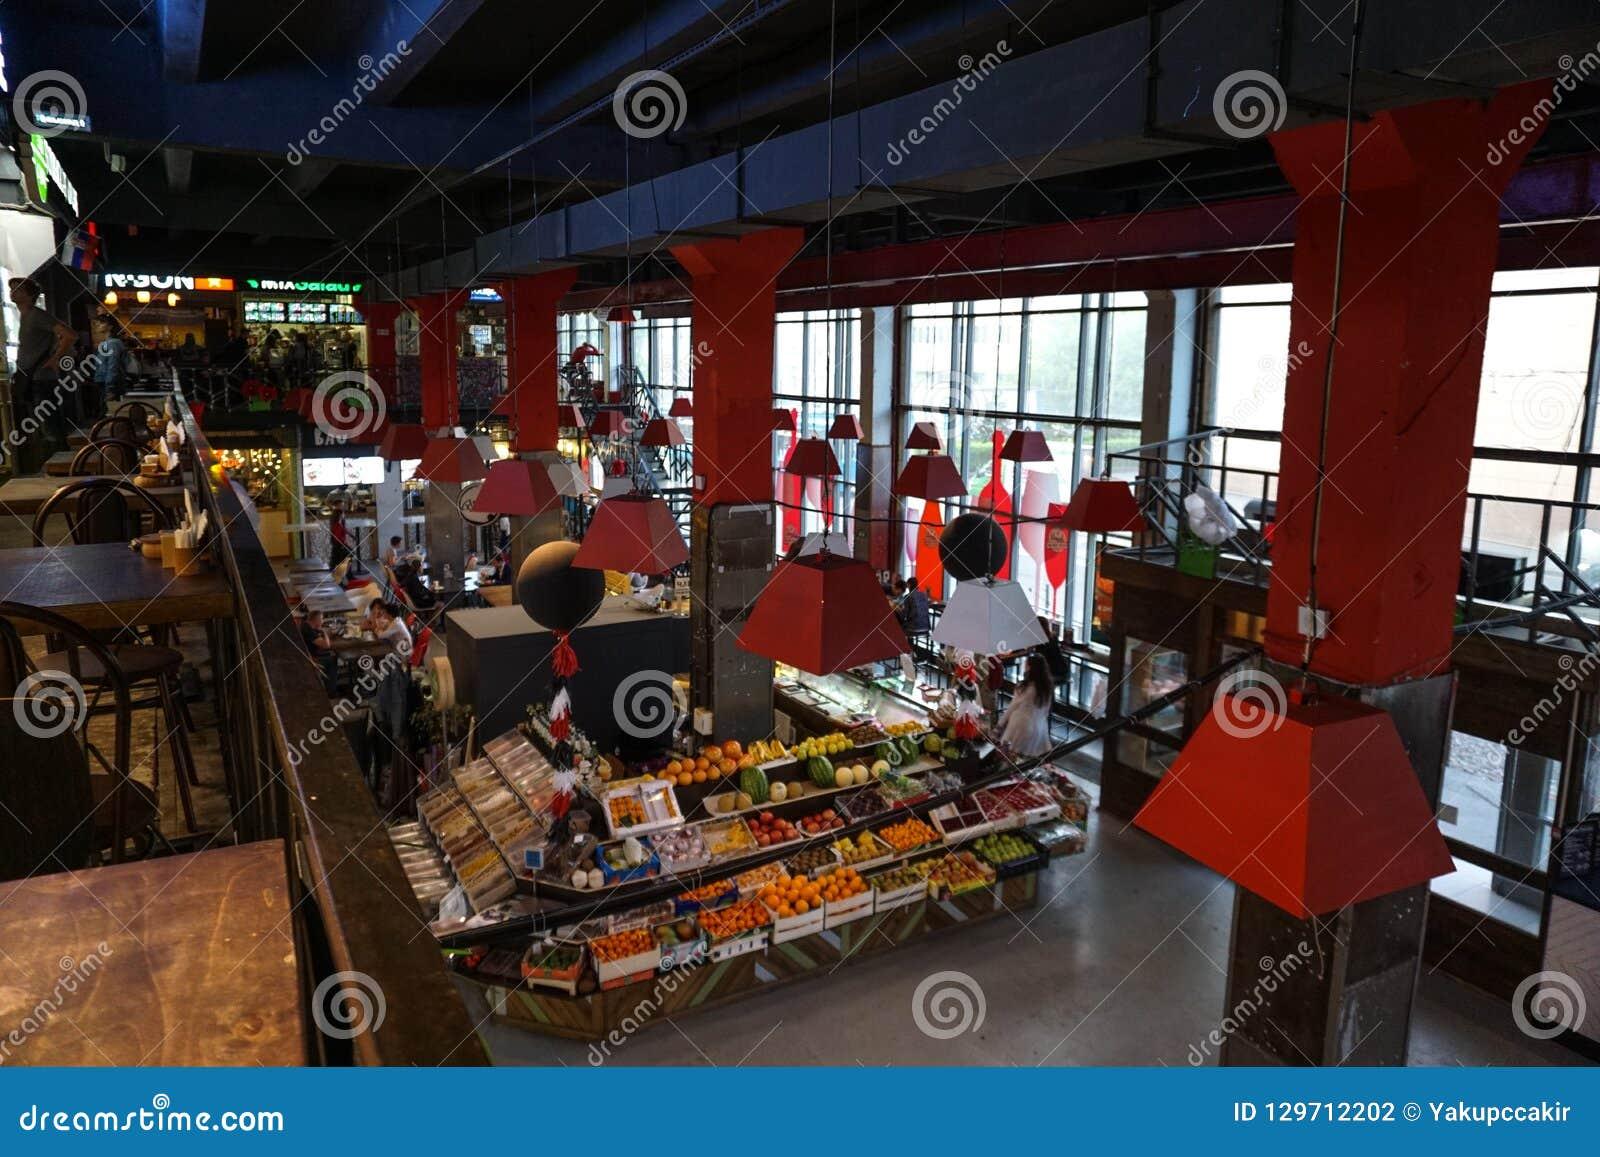 Moskau, Russland, bunter geschlossener Nahrungsmittelmarkt